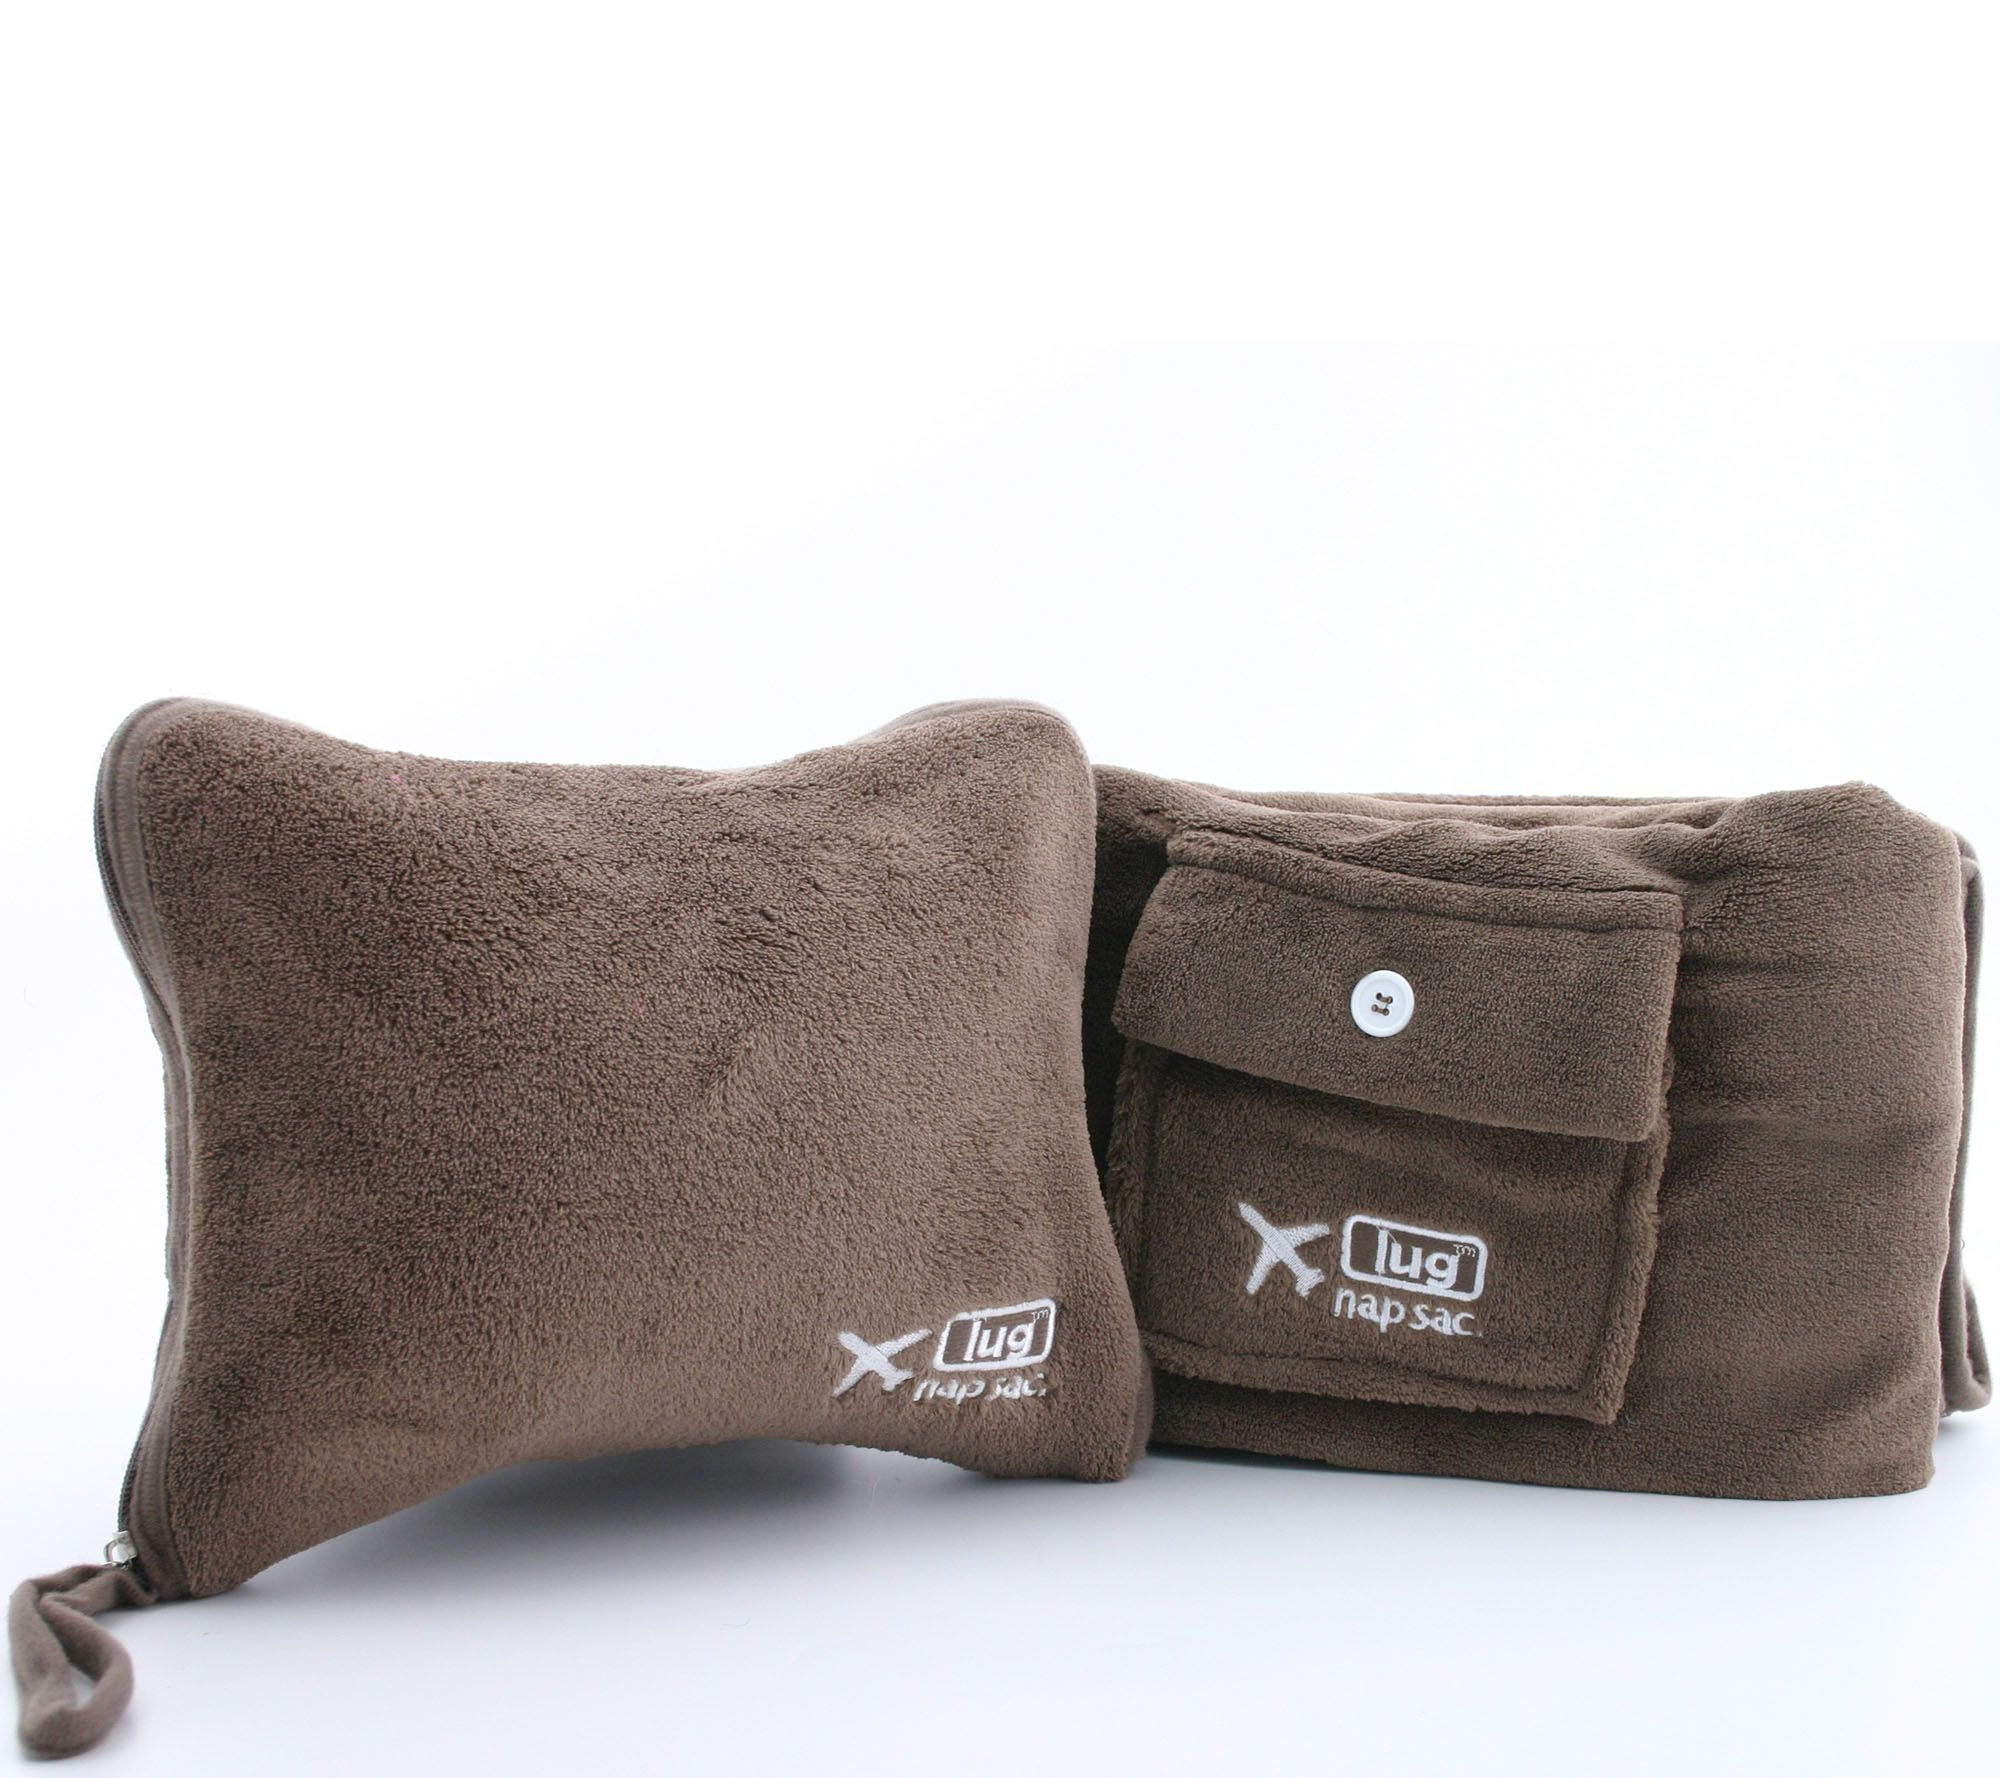 Lug Nap Sac Blanket   Pillow Set - Page 1 — QVC.com 210ddec79